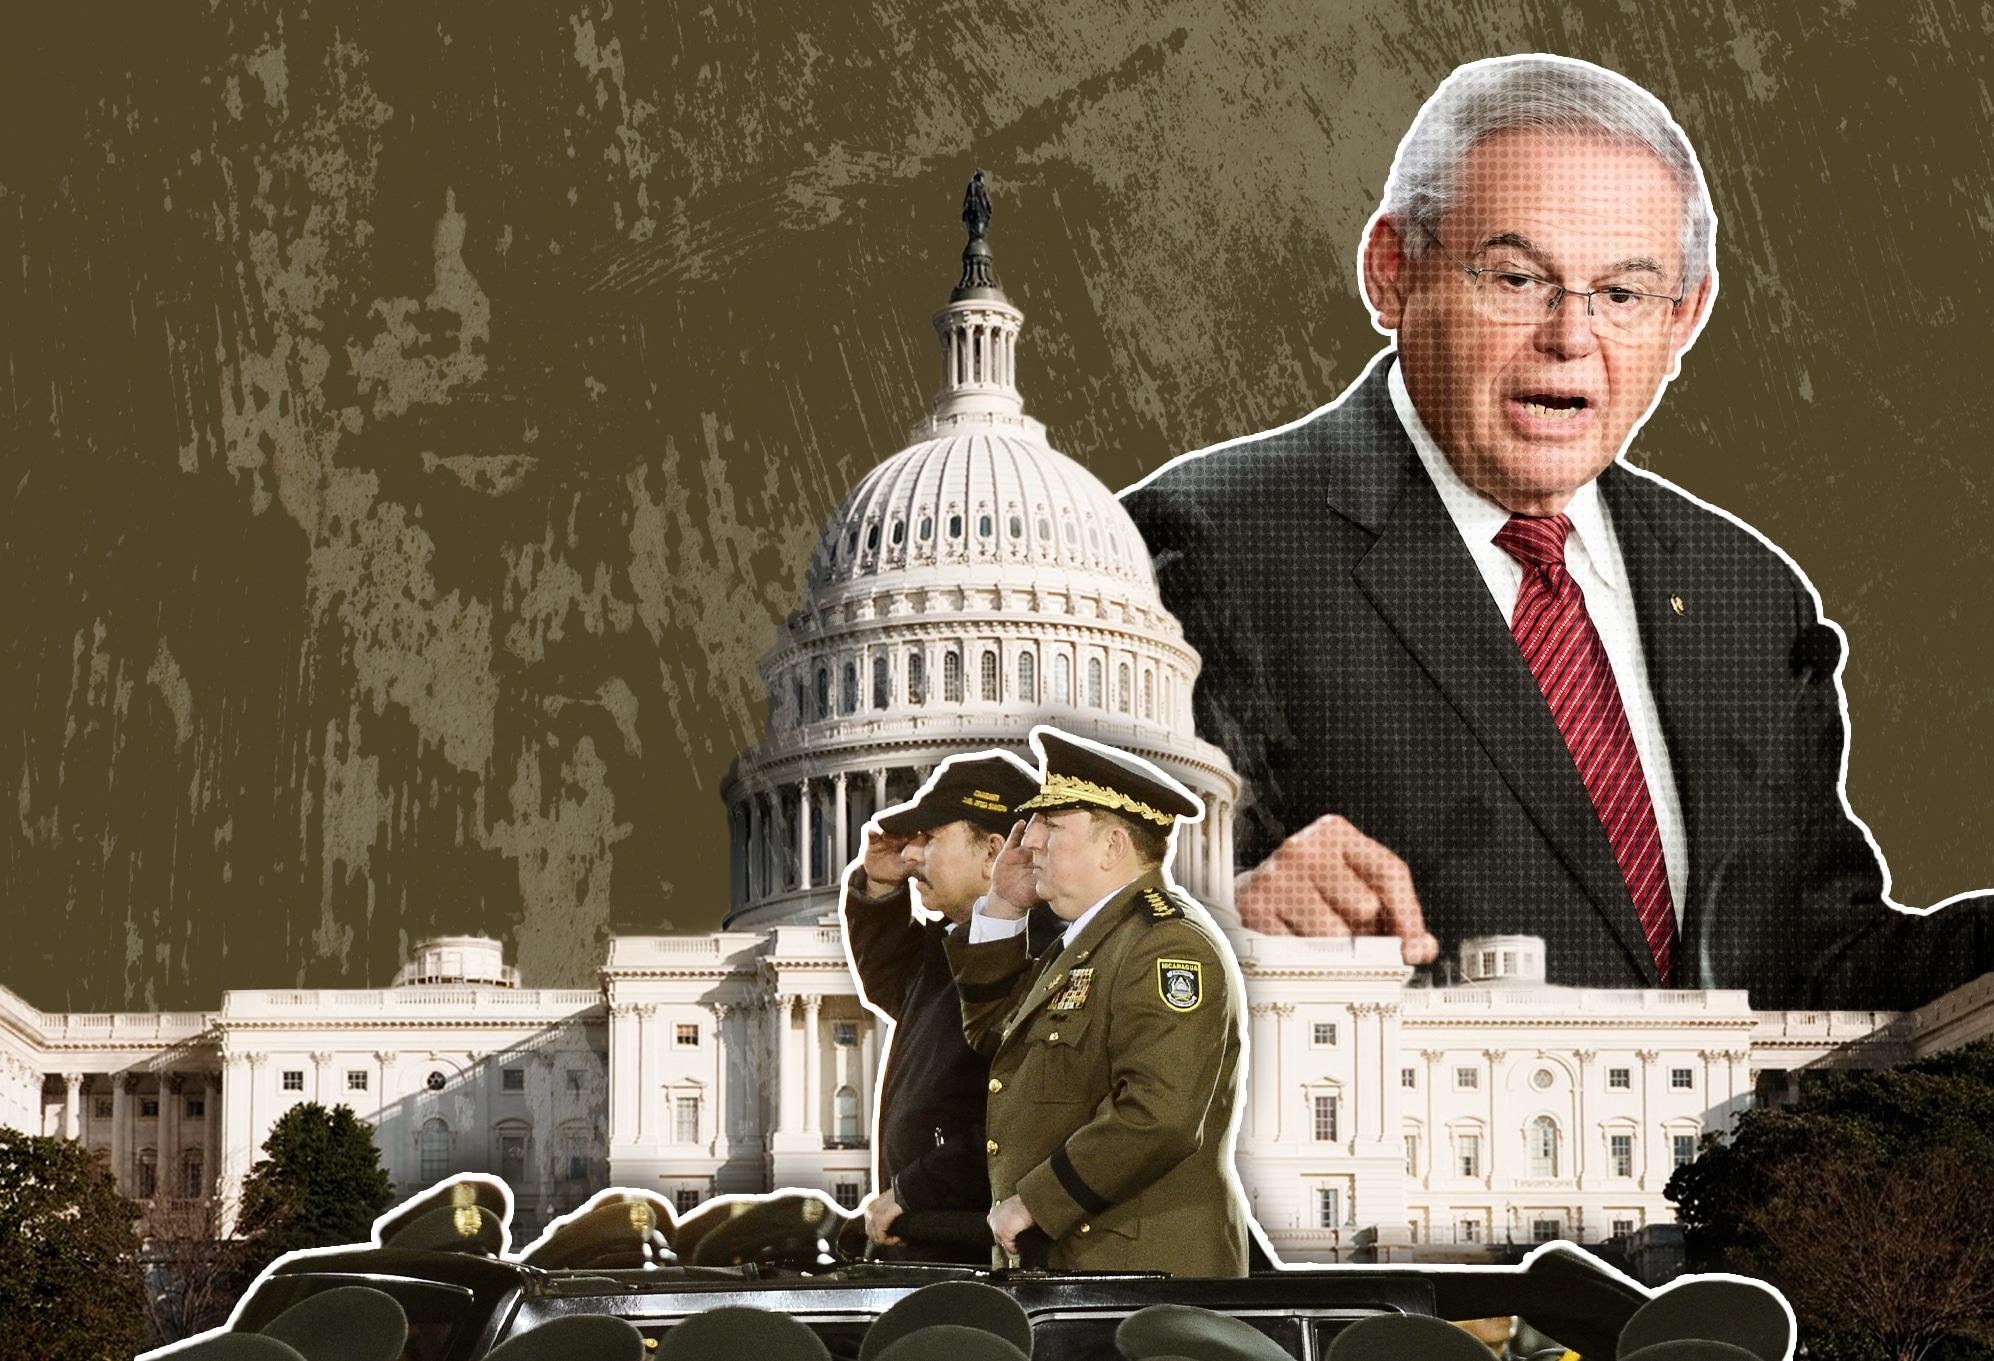 fondo de inversiones del ejército, Ejército de Nicaragua